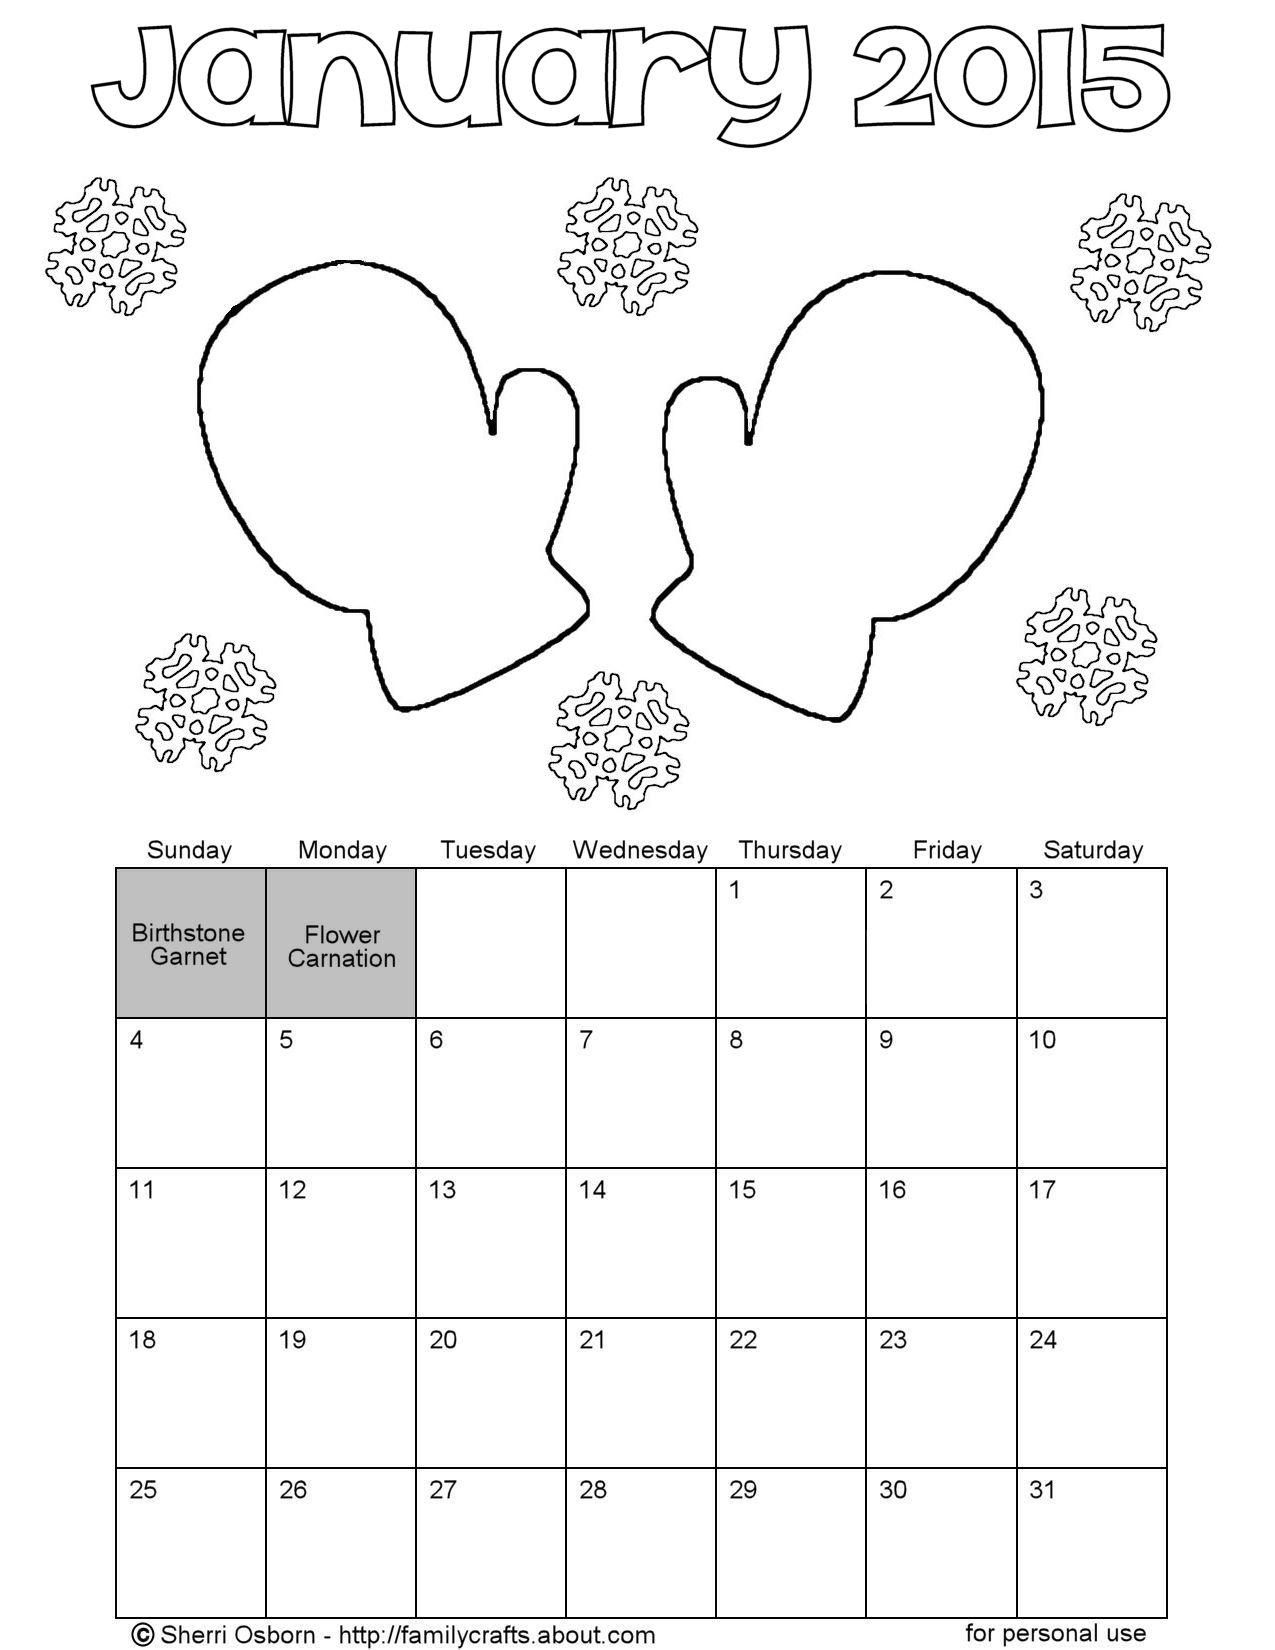 January 2015 Coloring Calendar